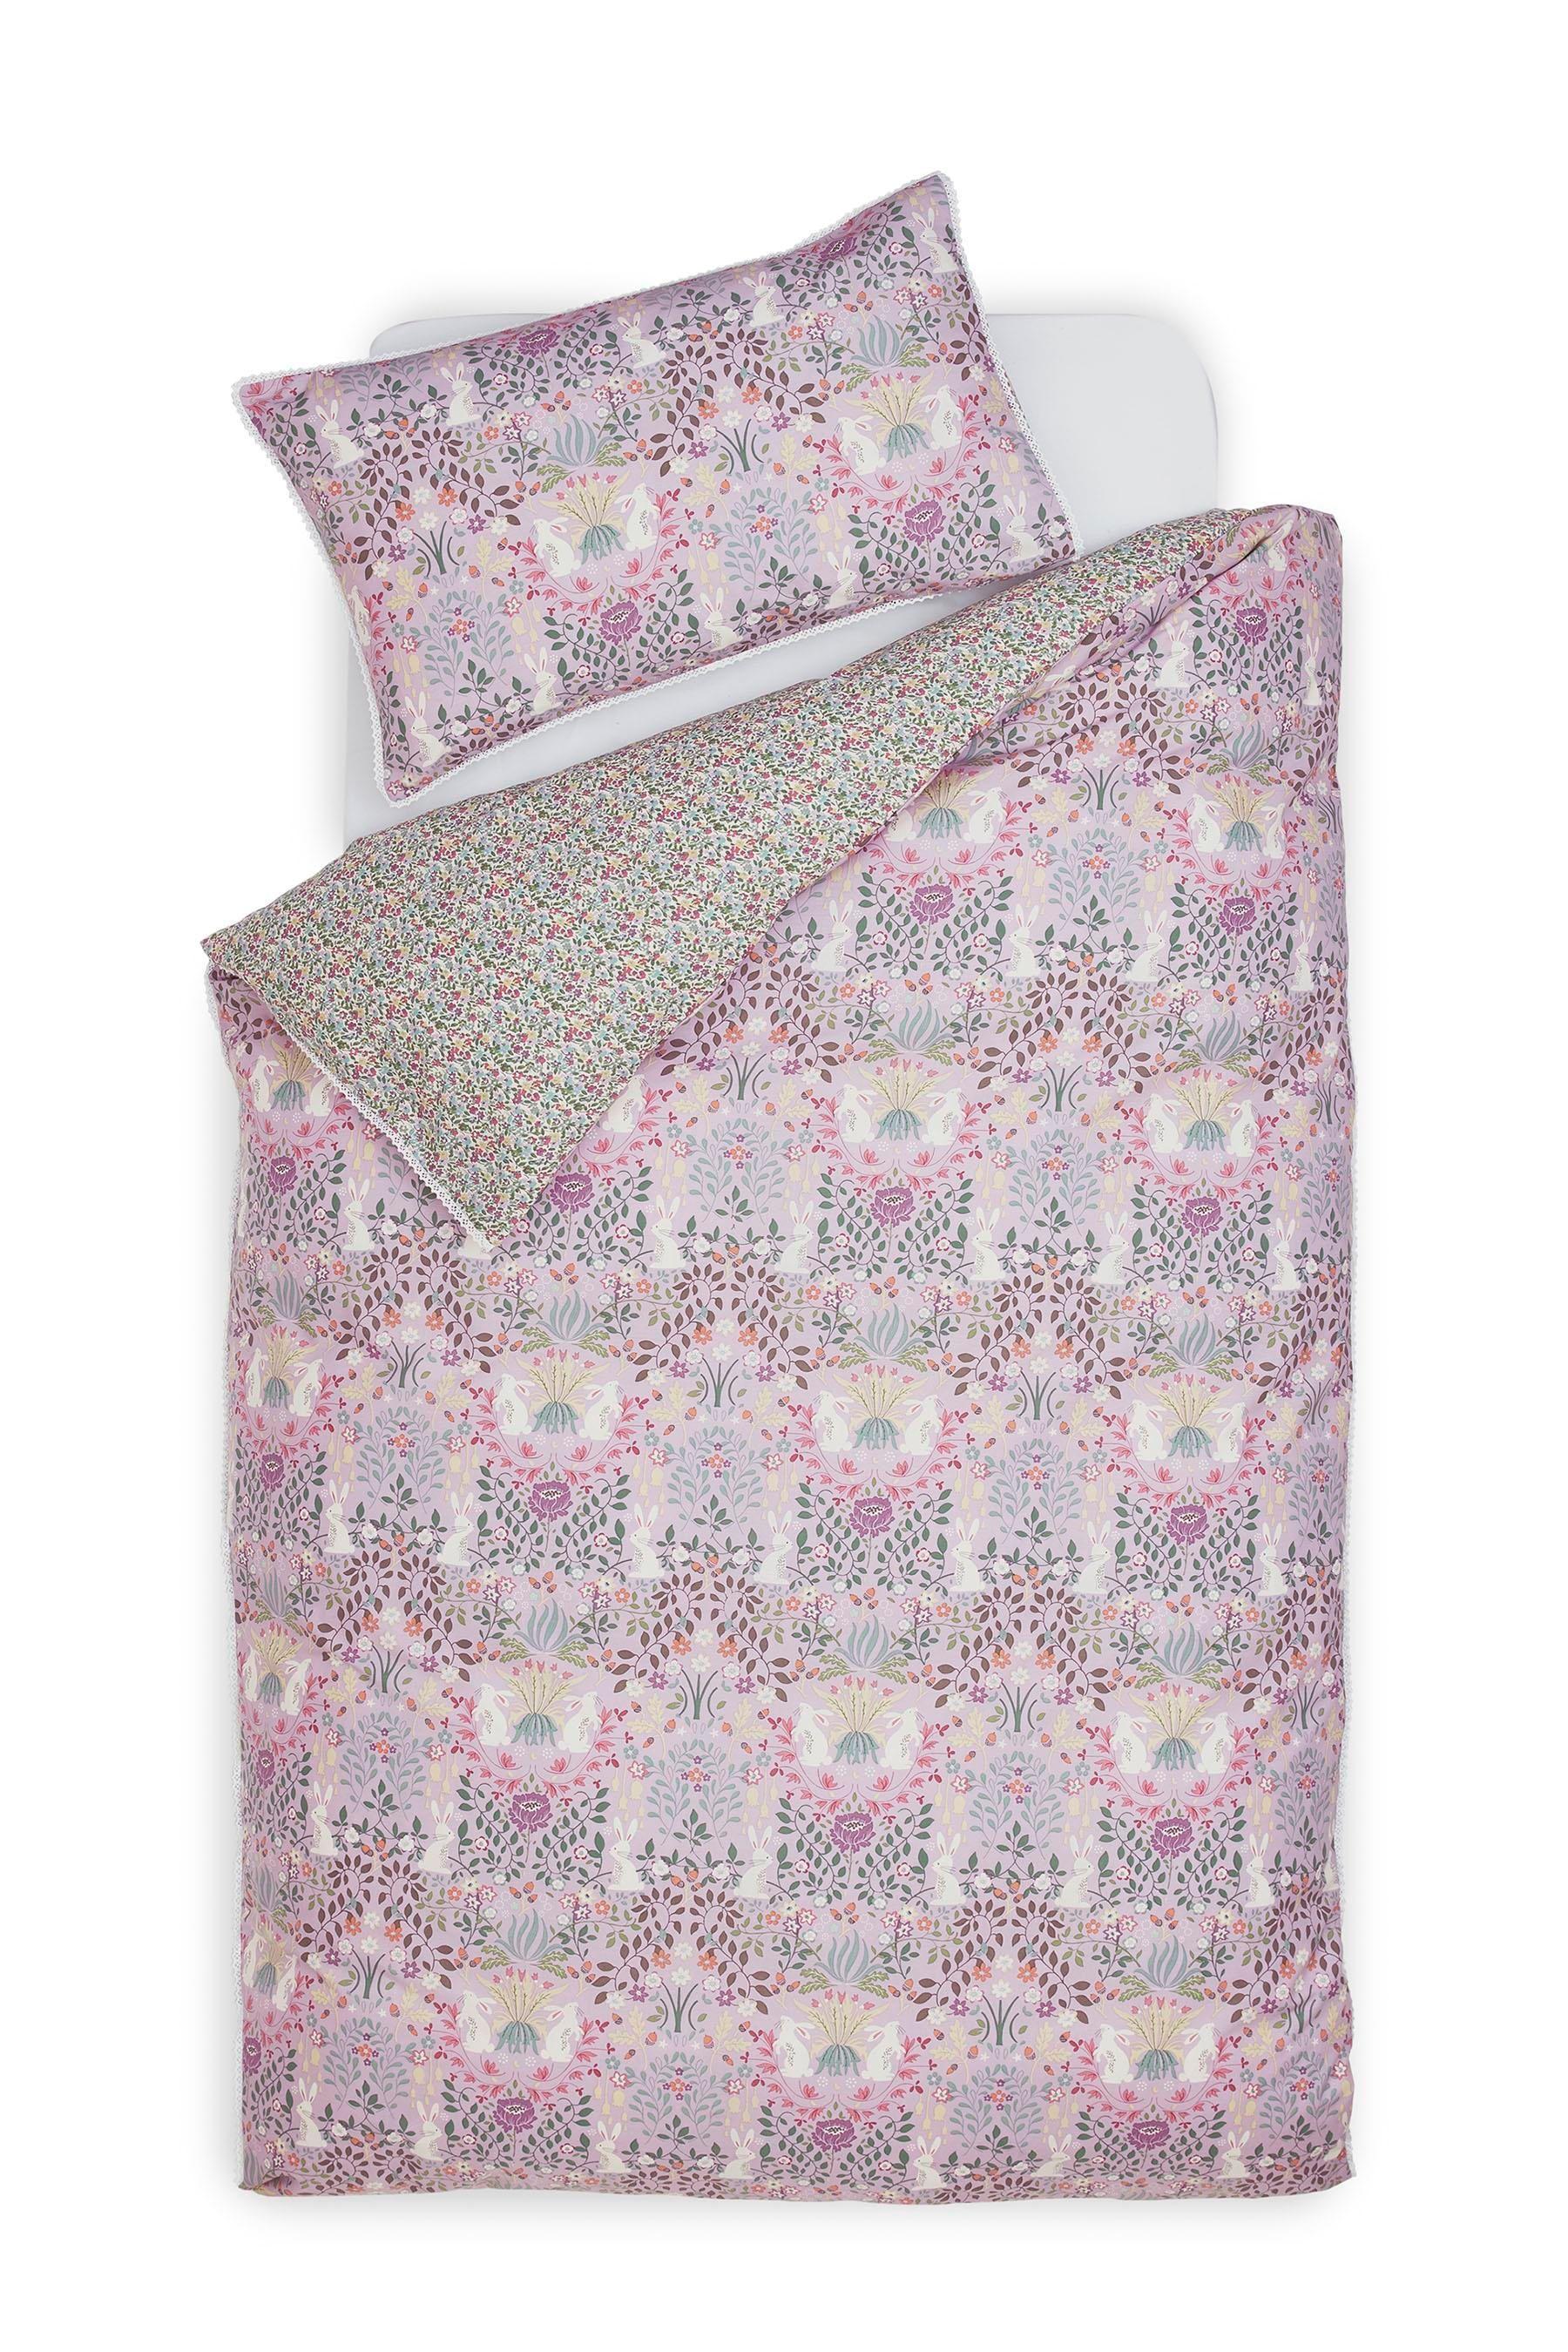 Buy Nancy Floral Bed Set from the Next UK online shop